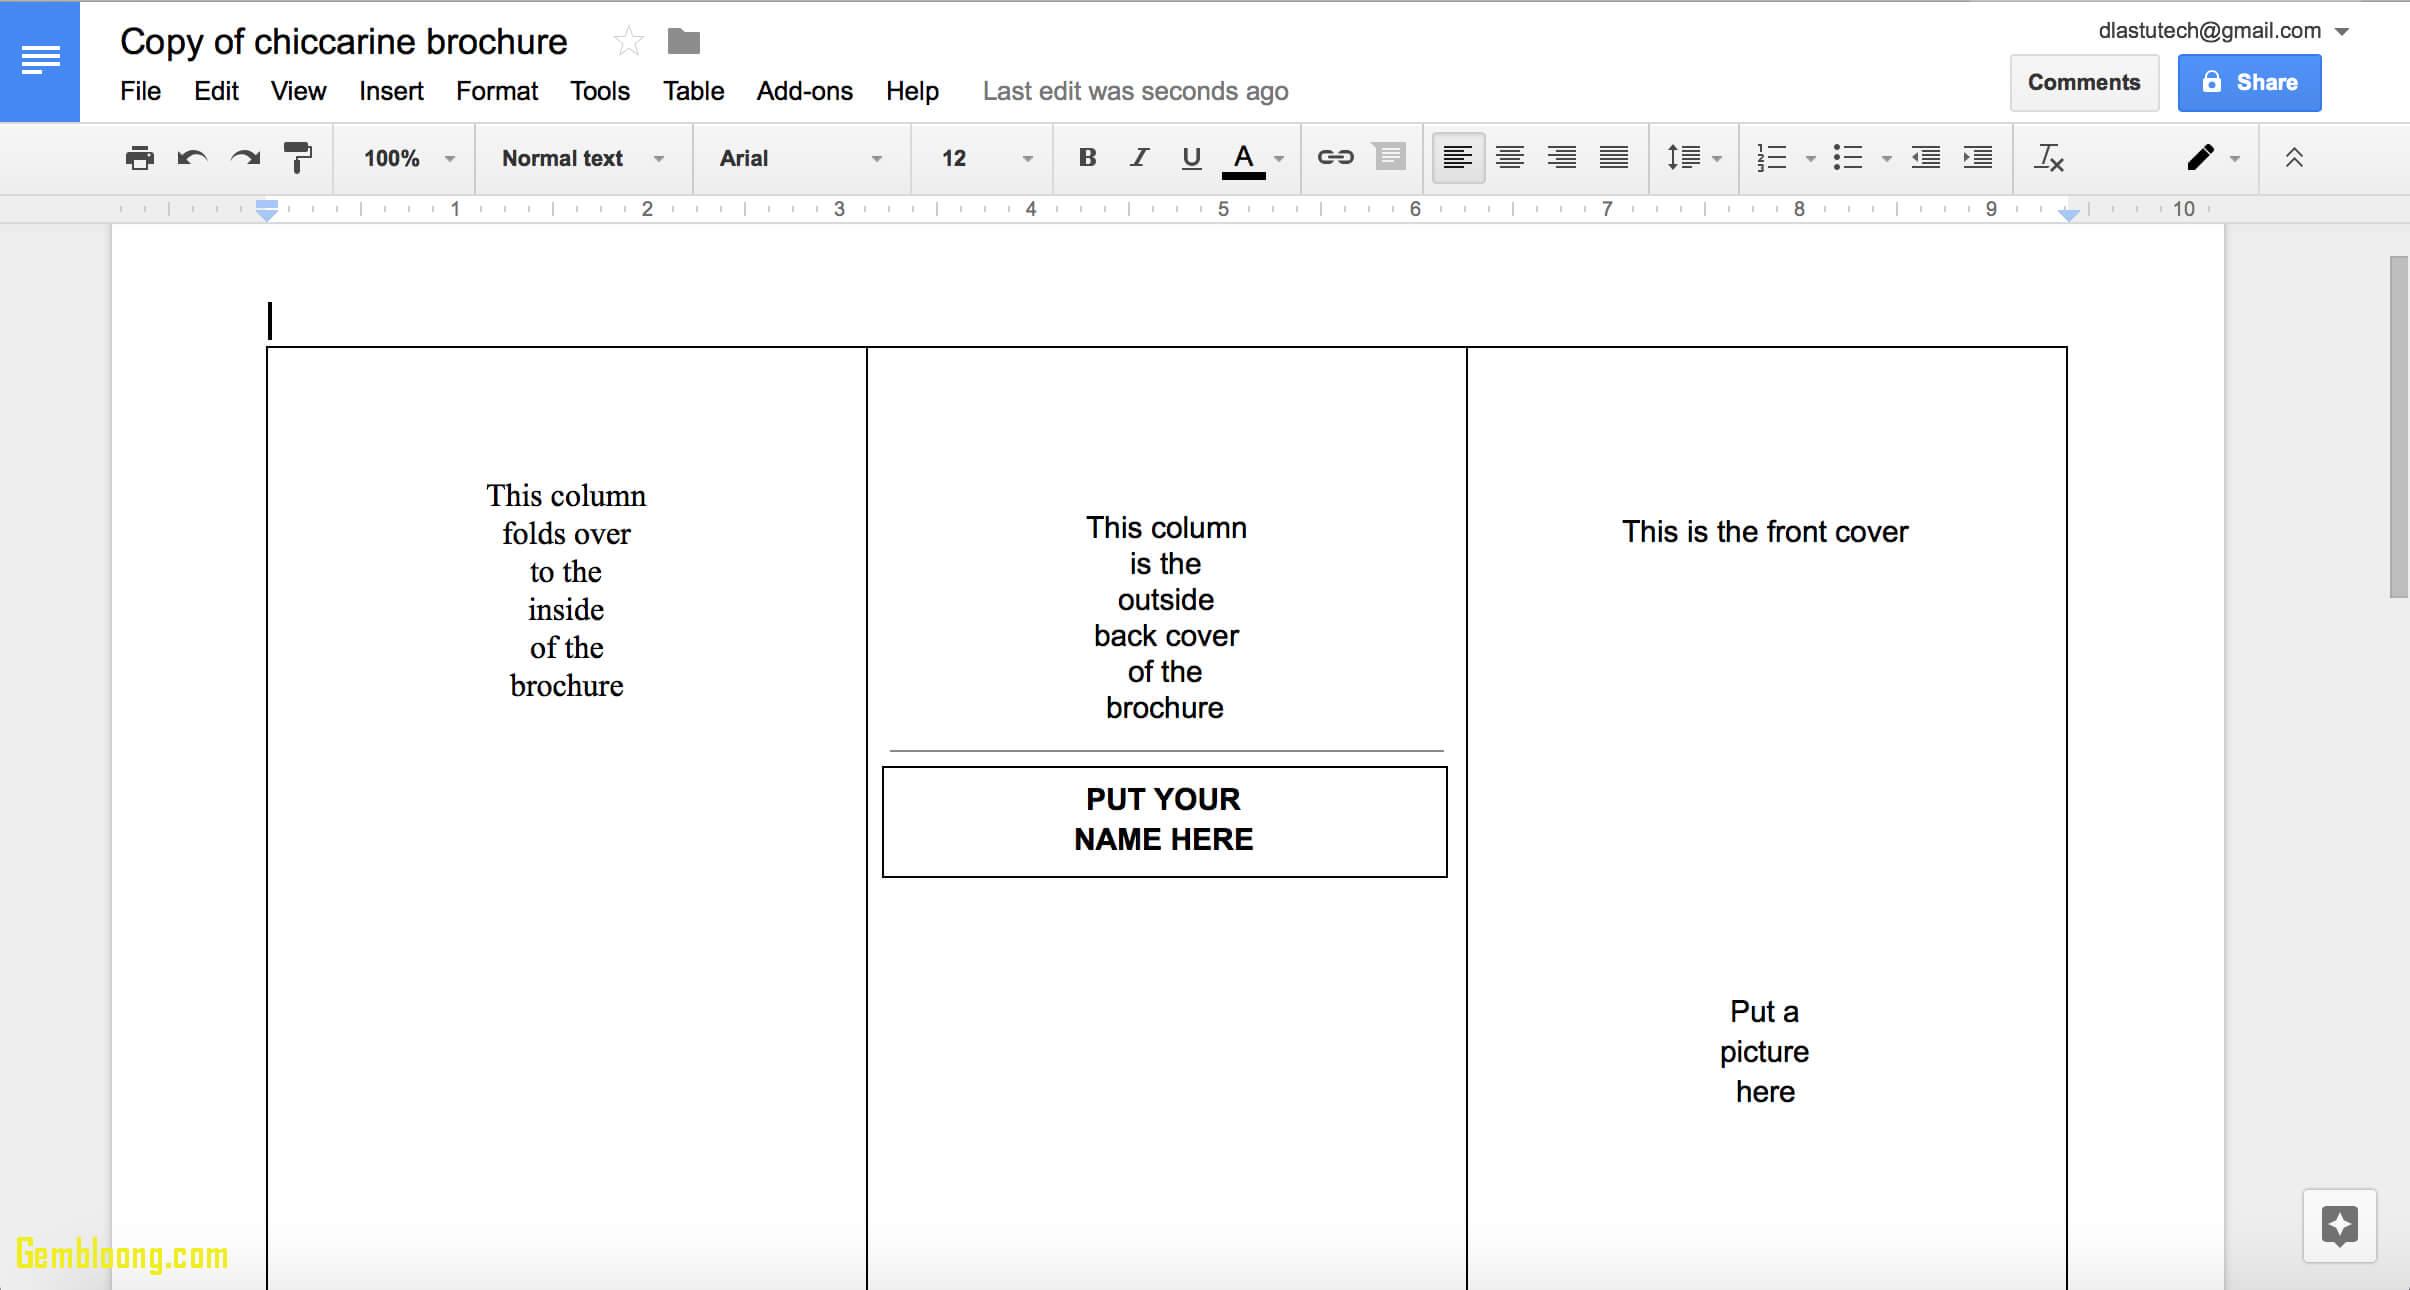 Google Drive Brochure Template - Cokhithuanpham Intended For Brochure Template Google Drive